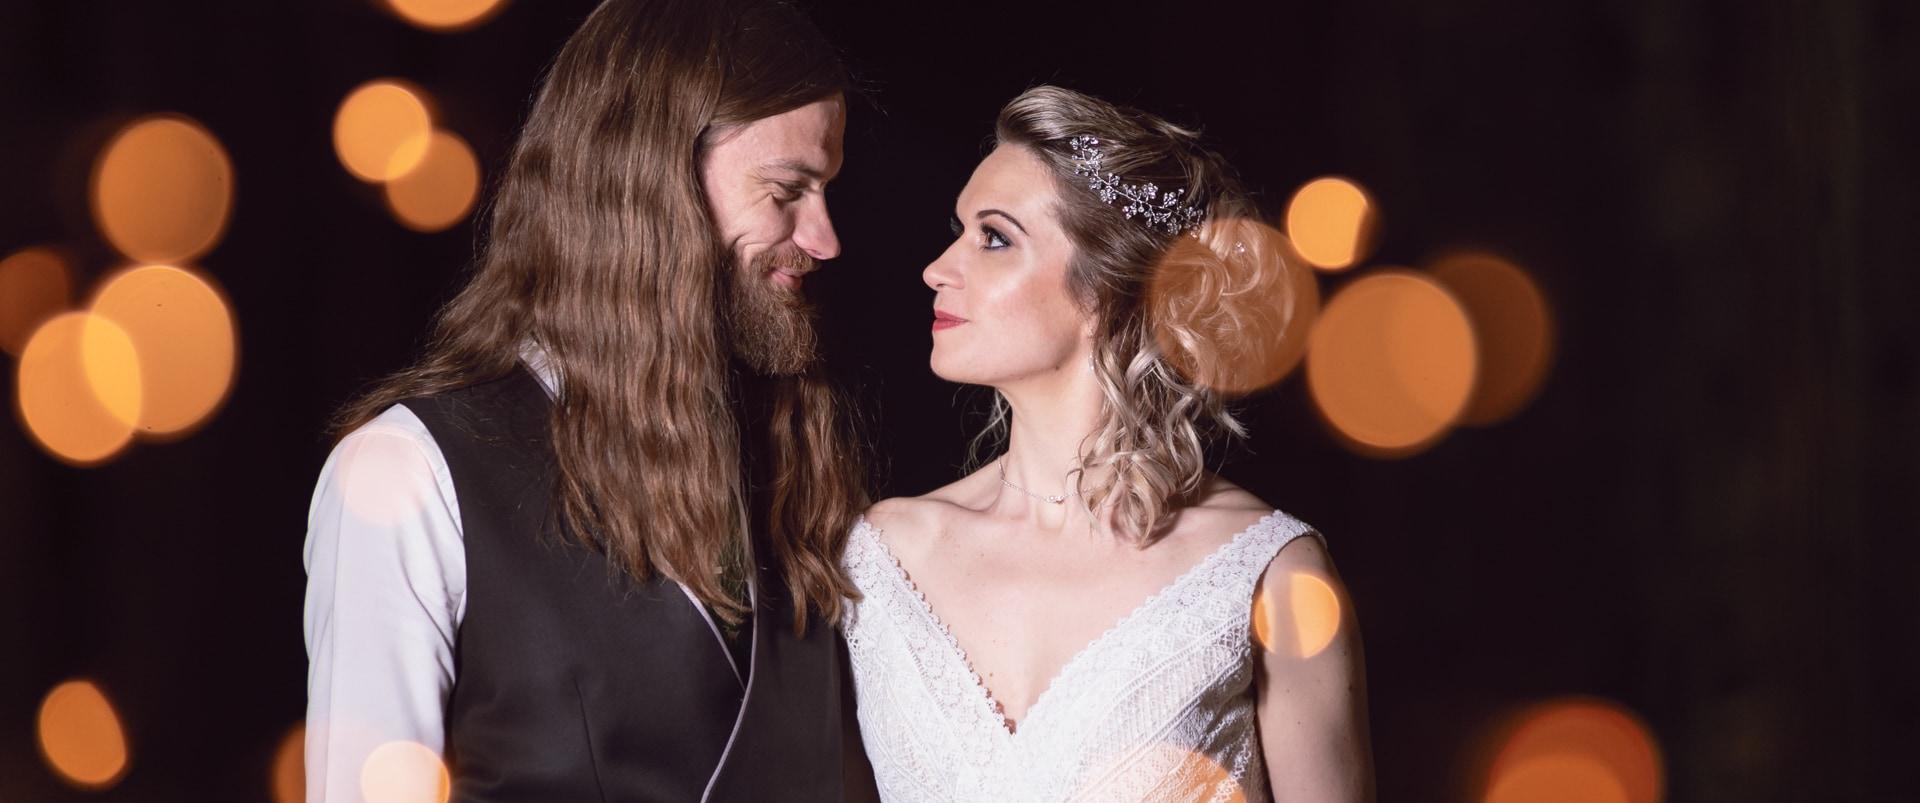 Mélanie et Aaron-photo-mariage-thionville-MleanieEtAaron–9